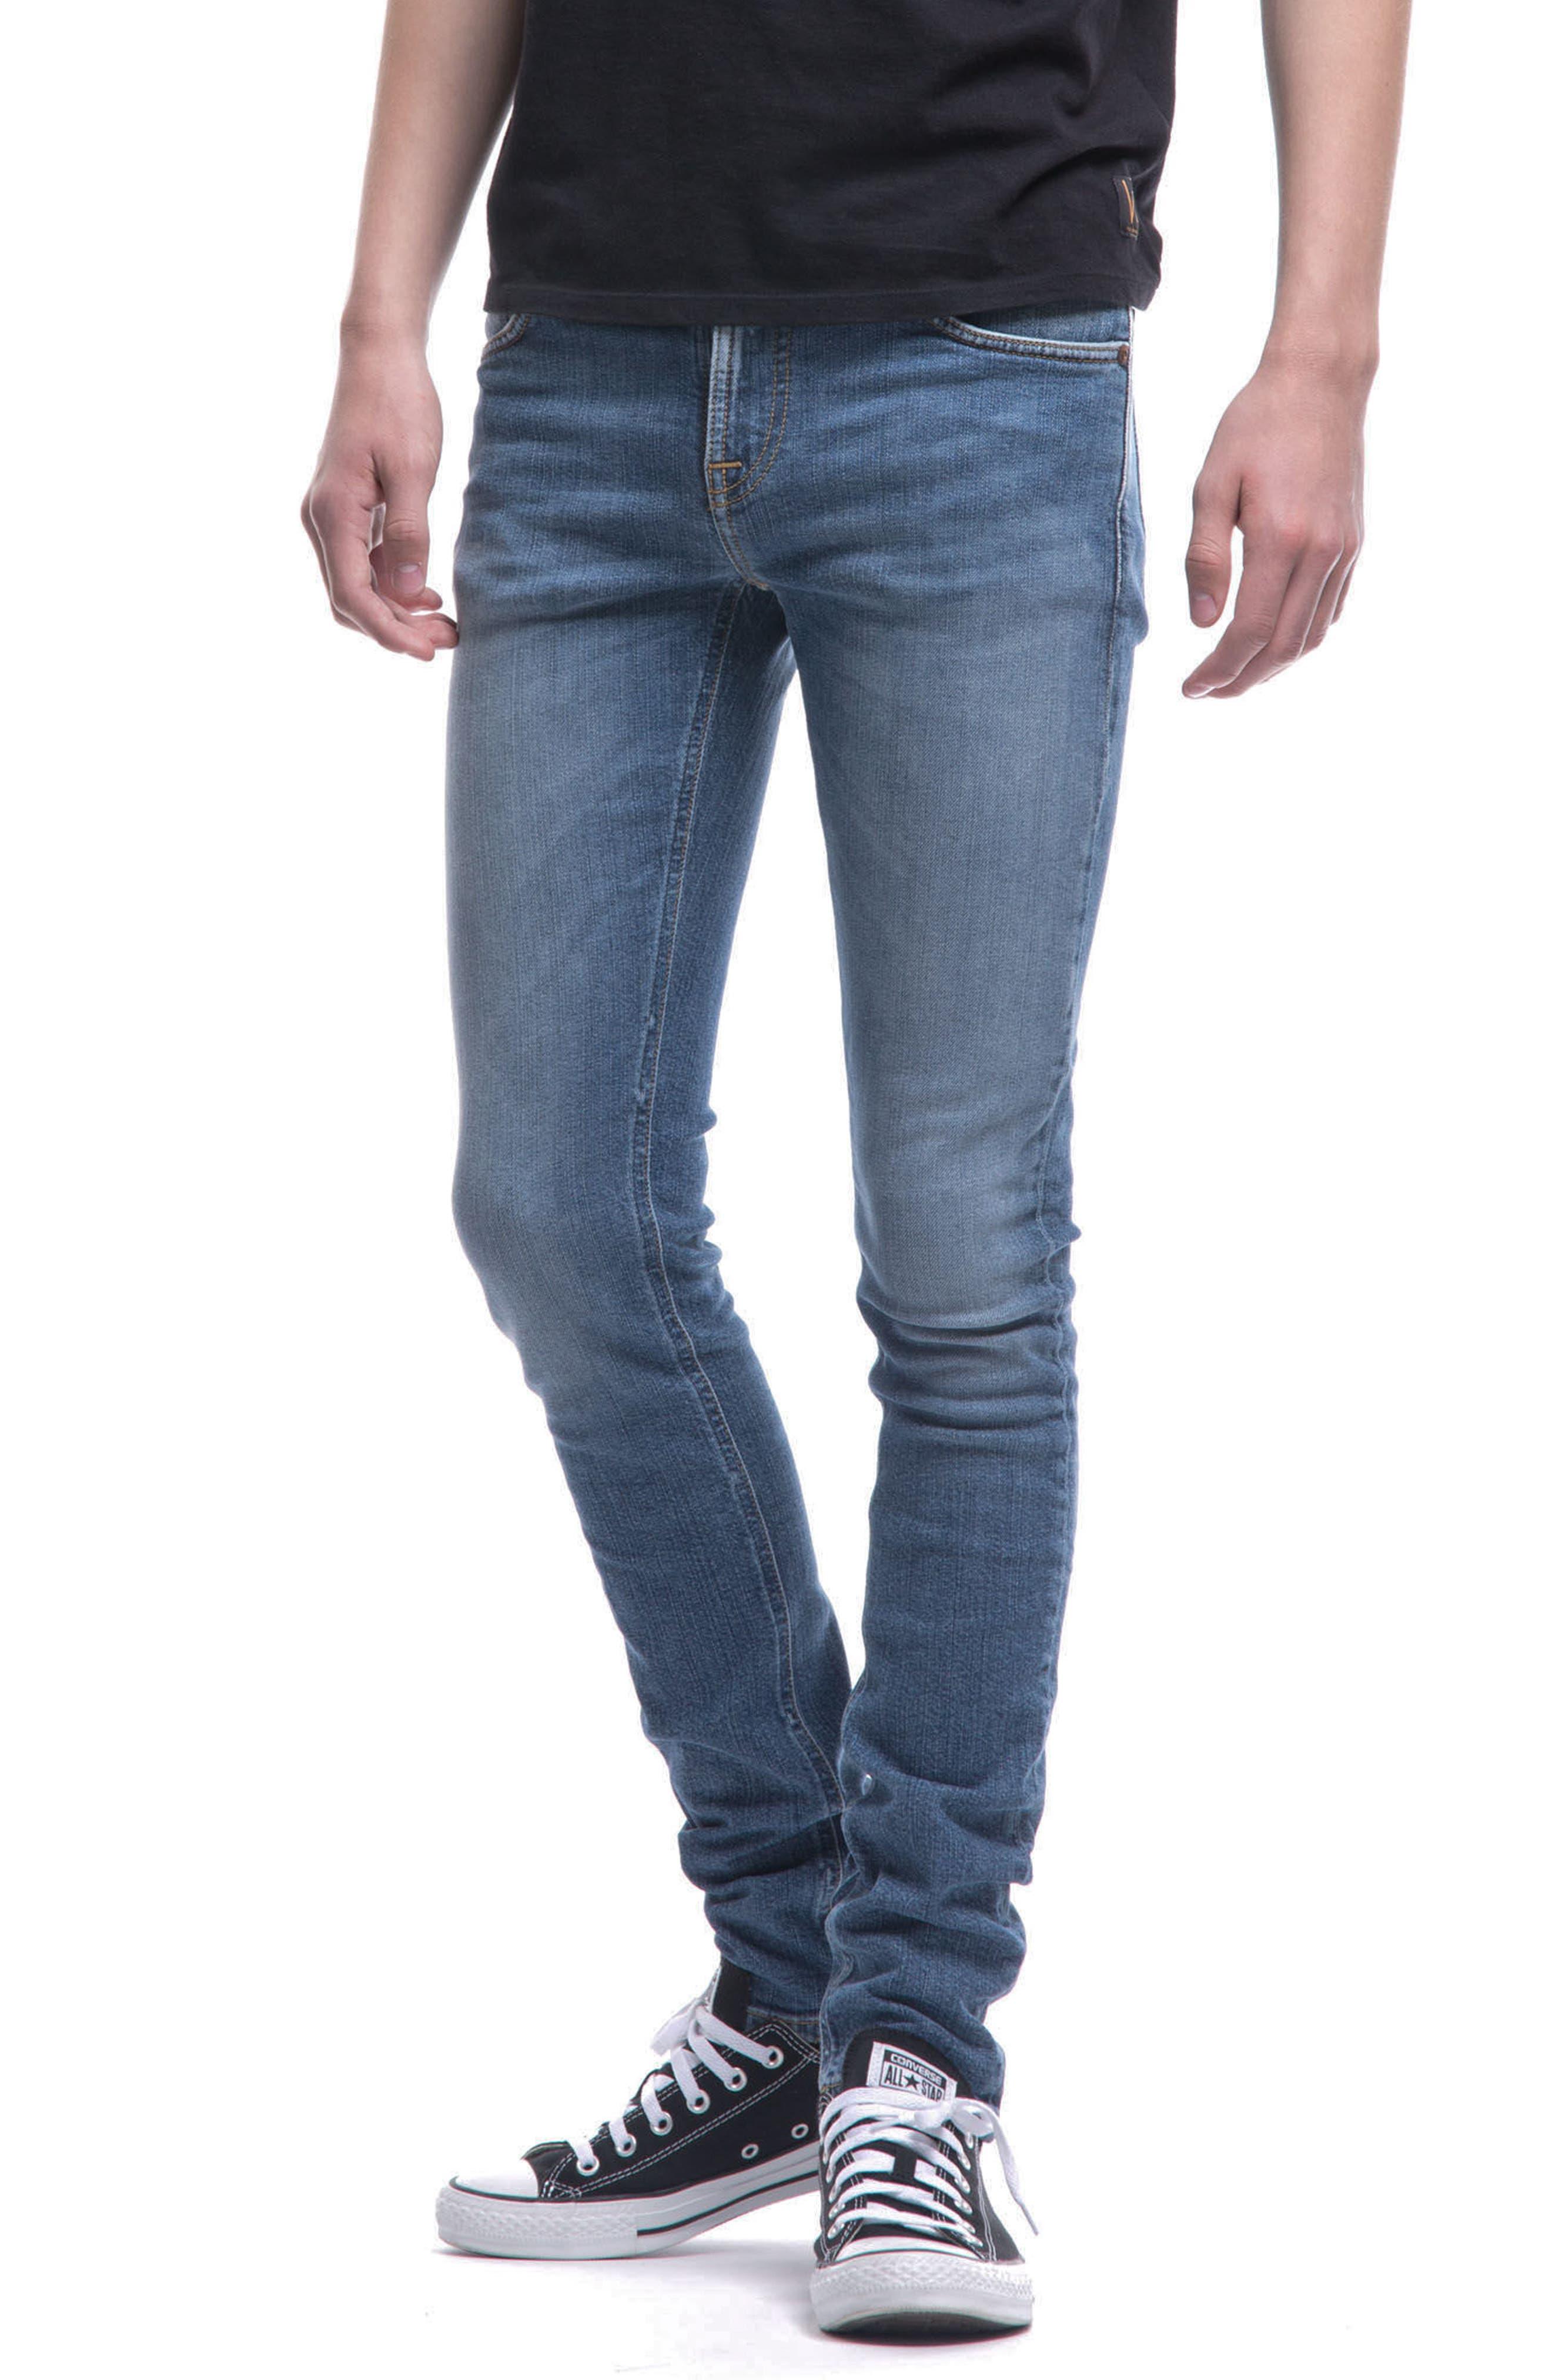 Skinny Lin Skinny Fit Jeans,                             Alternate thumbnail 3, color,                             460